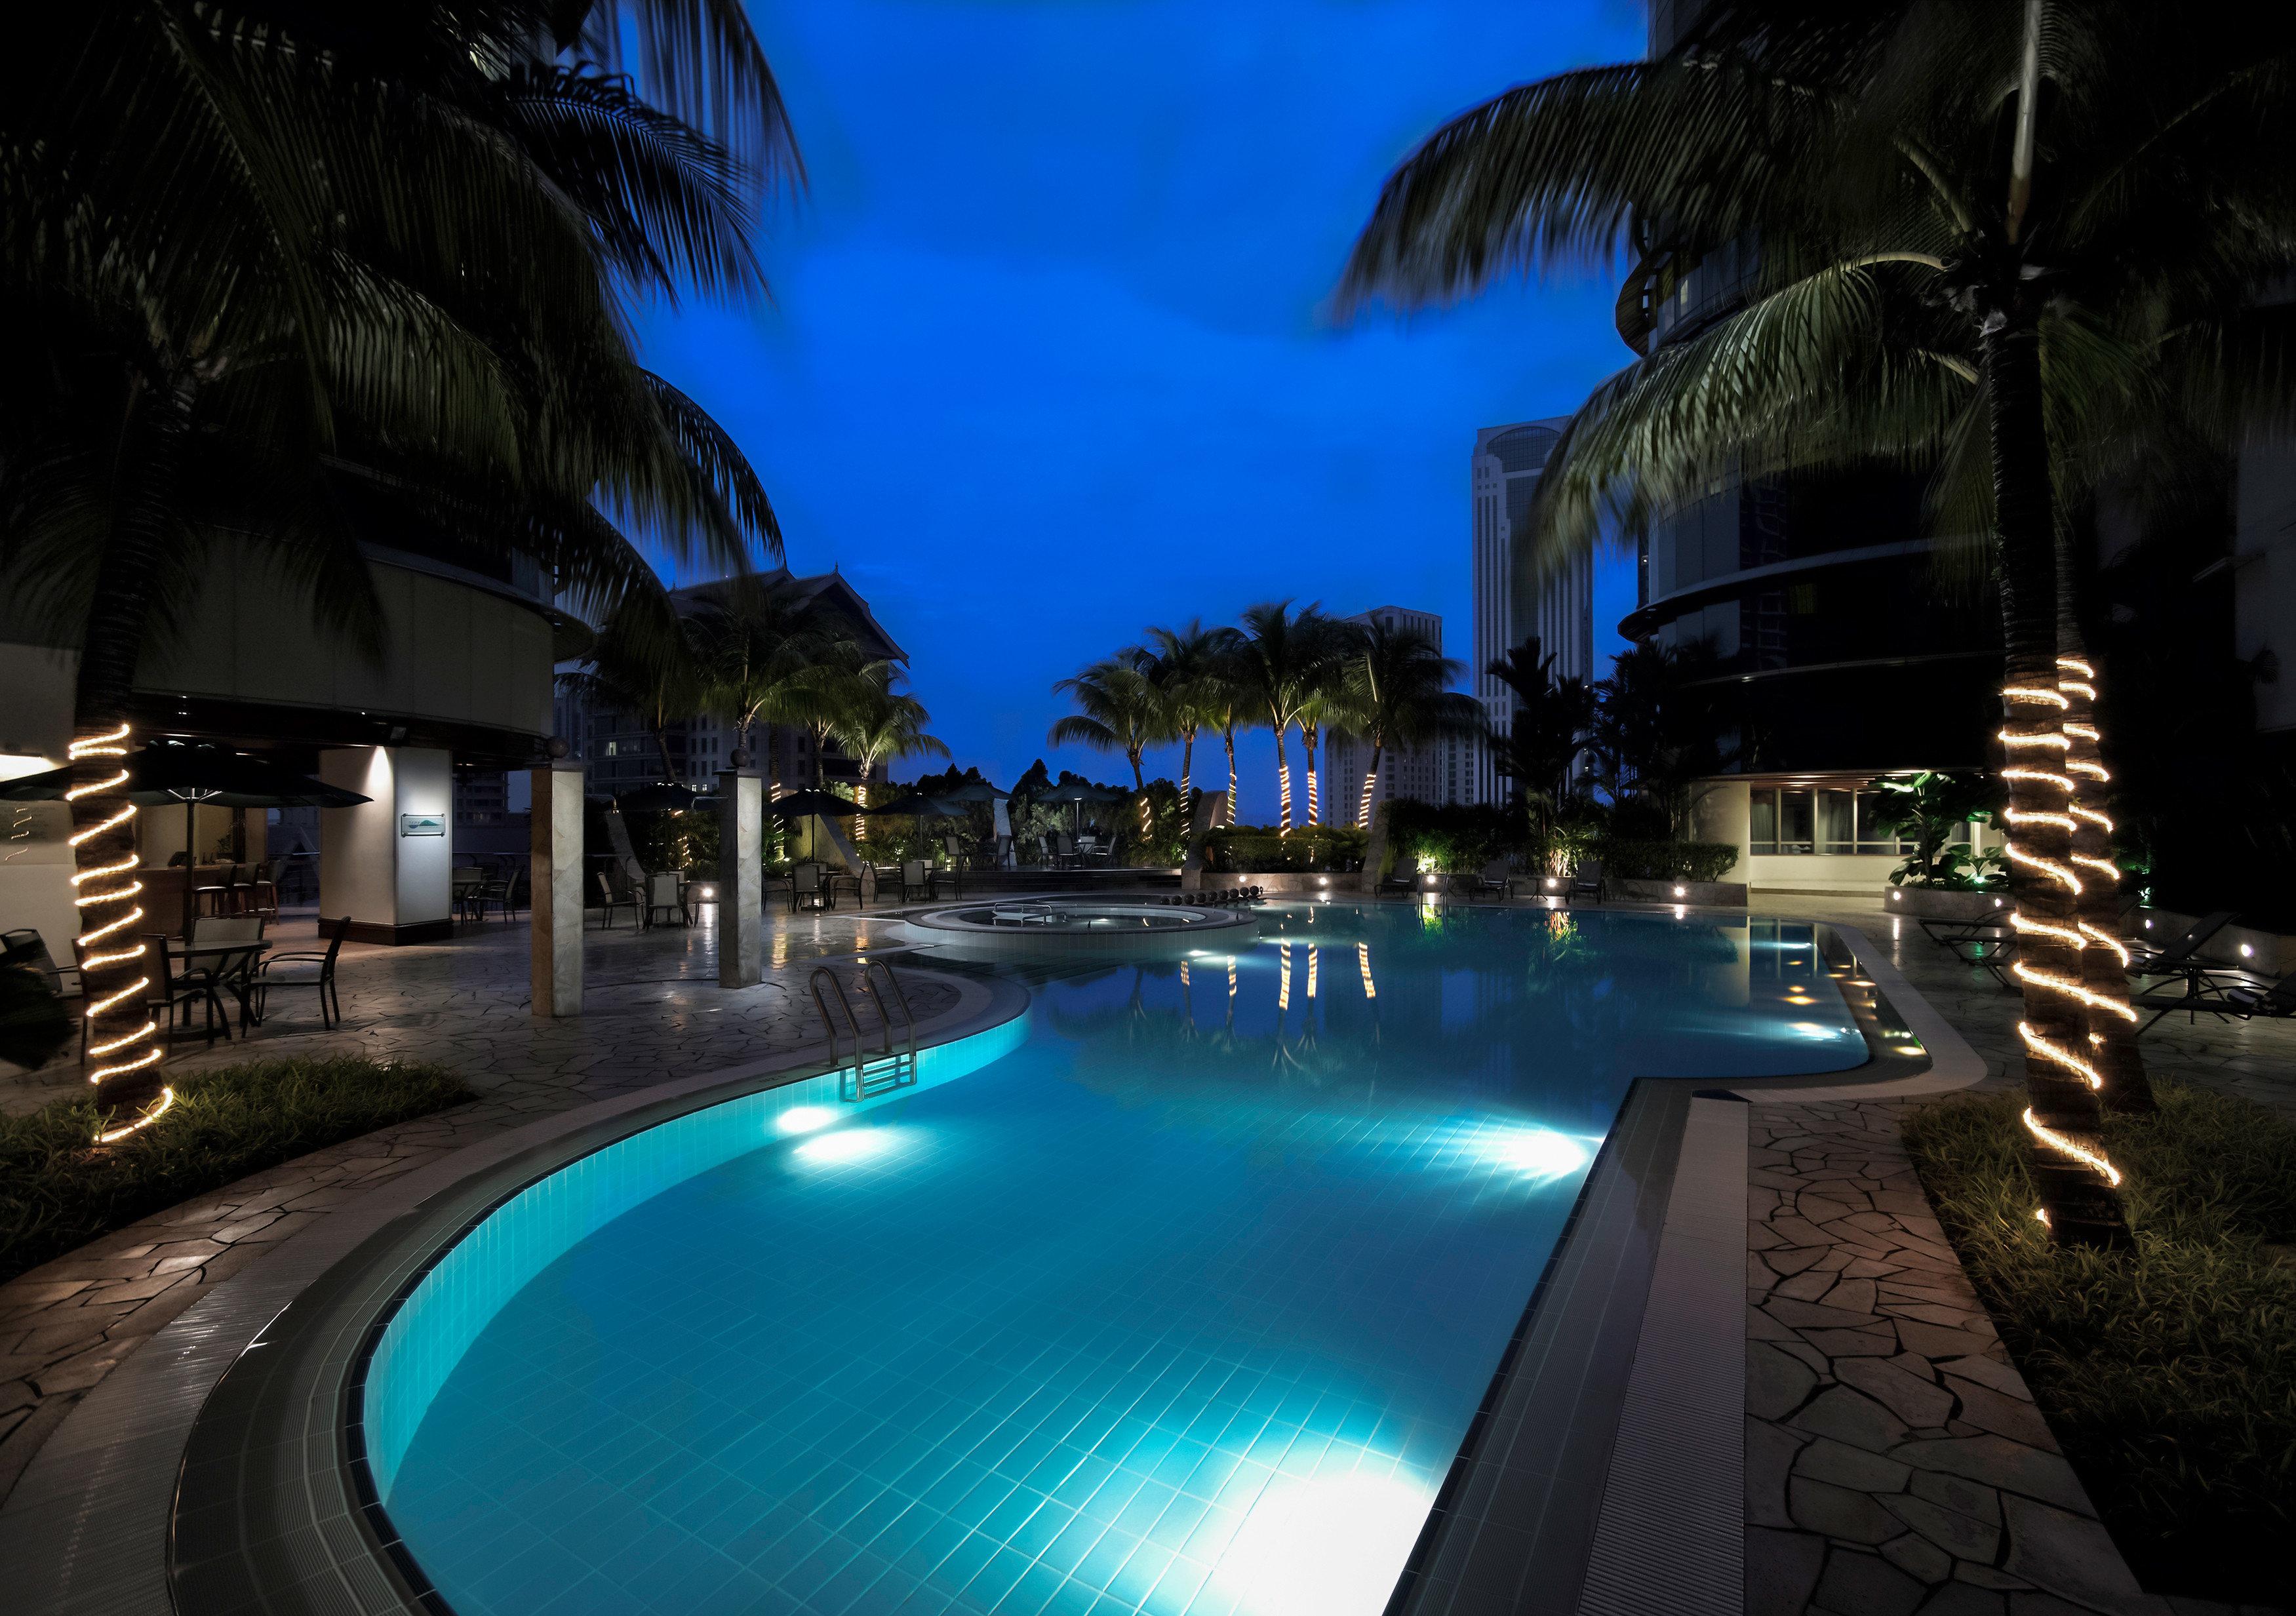 Modern Pool swimming pool street night Resort landscape lighting mansion screenshot condominium palm empty lined